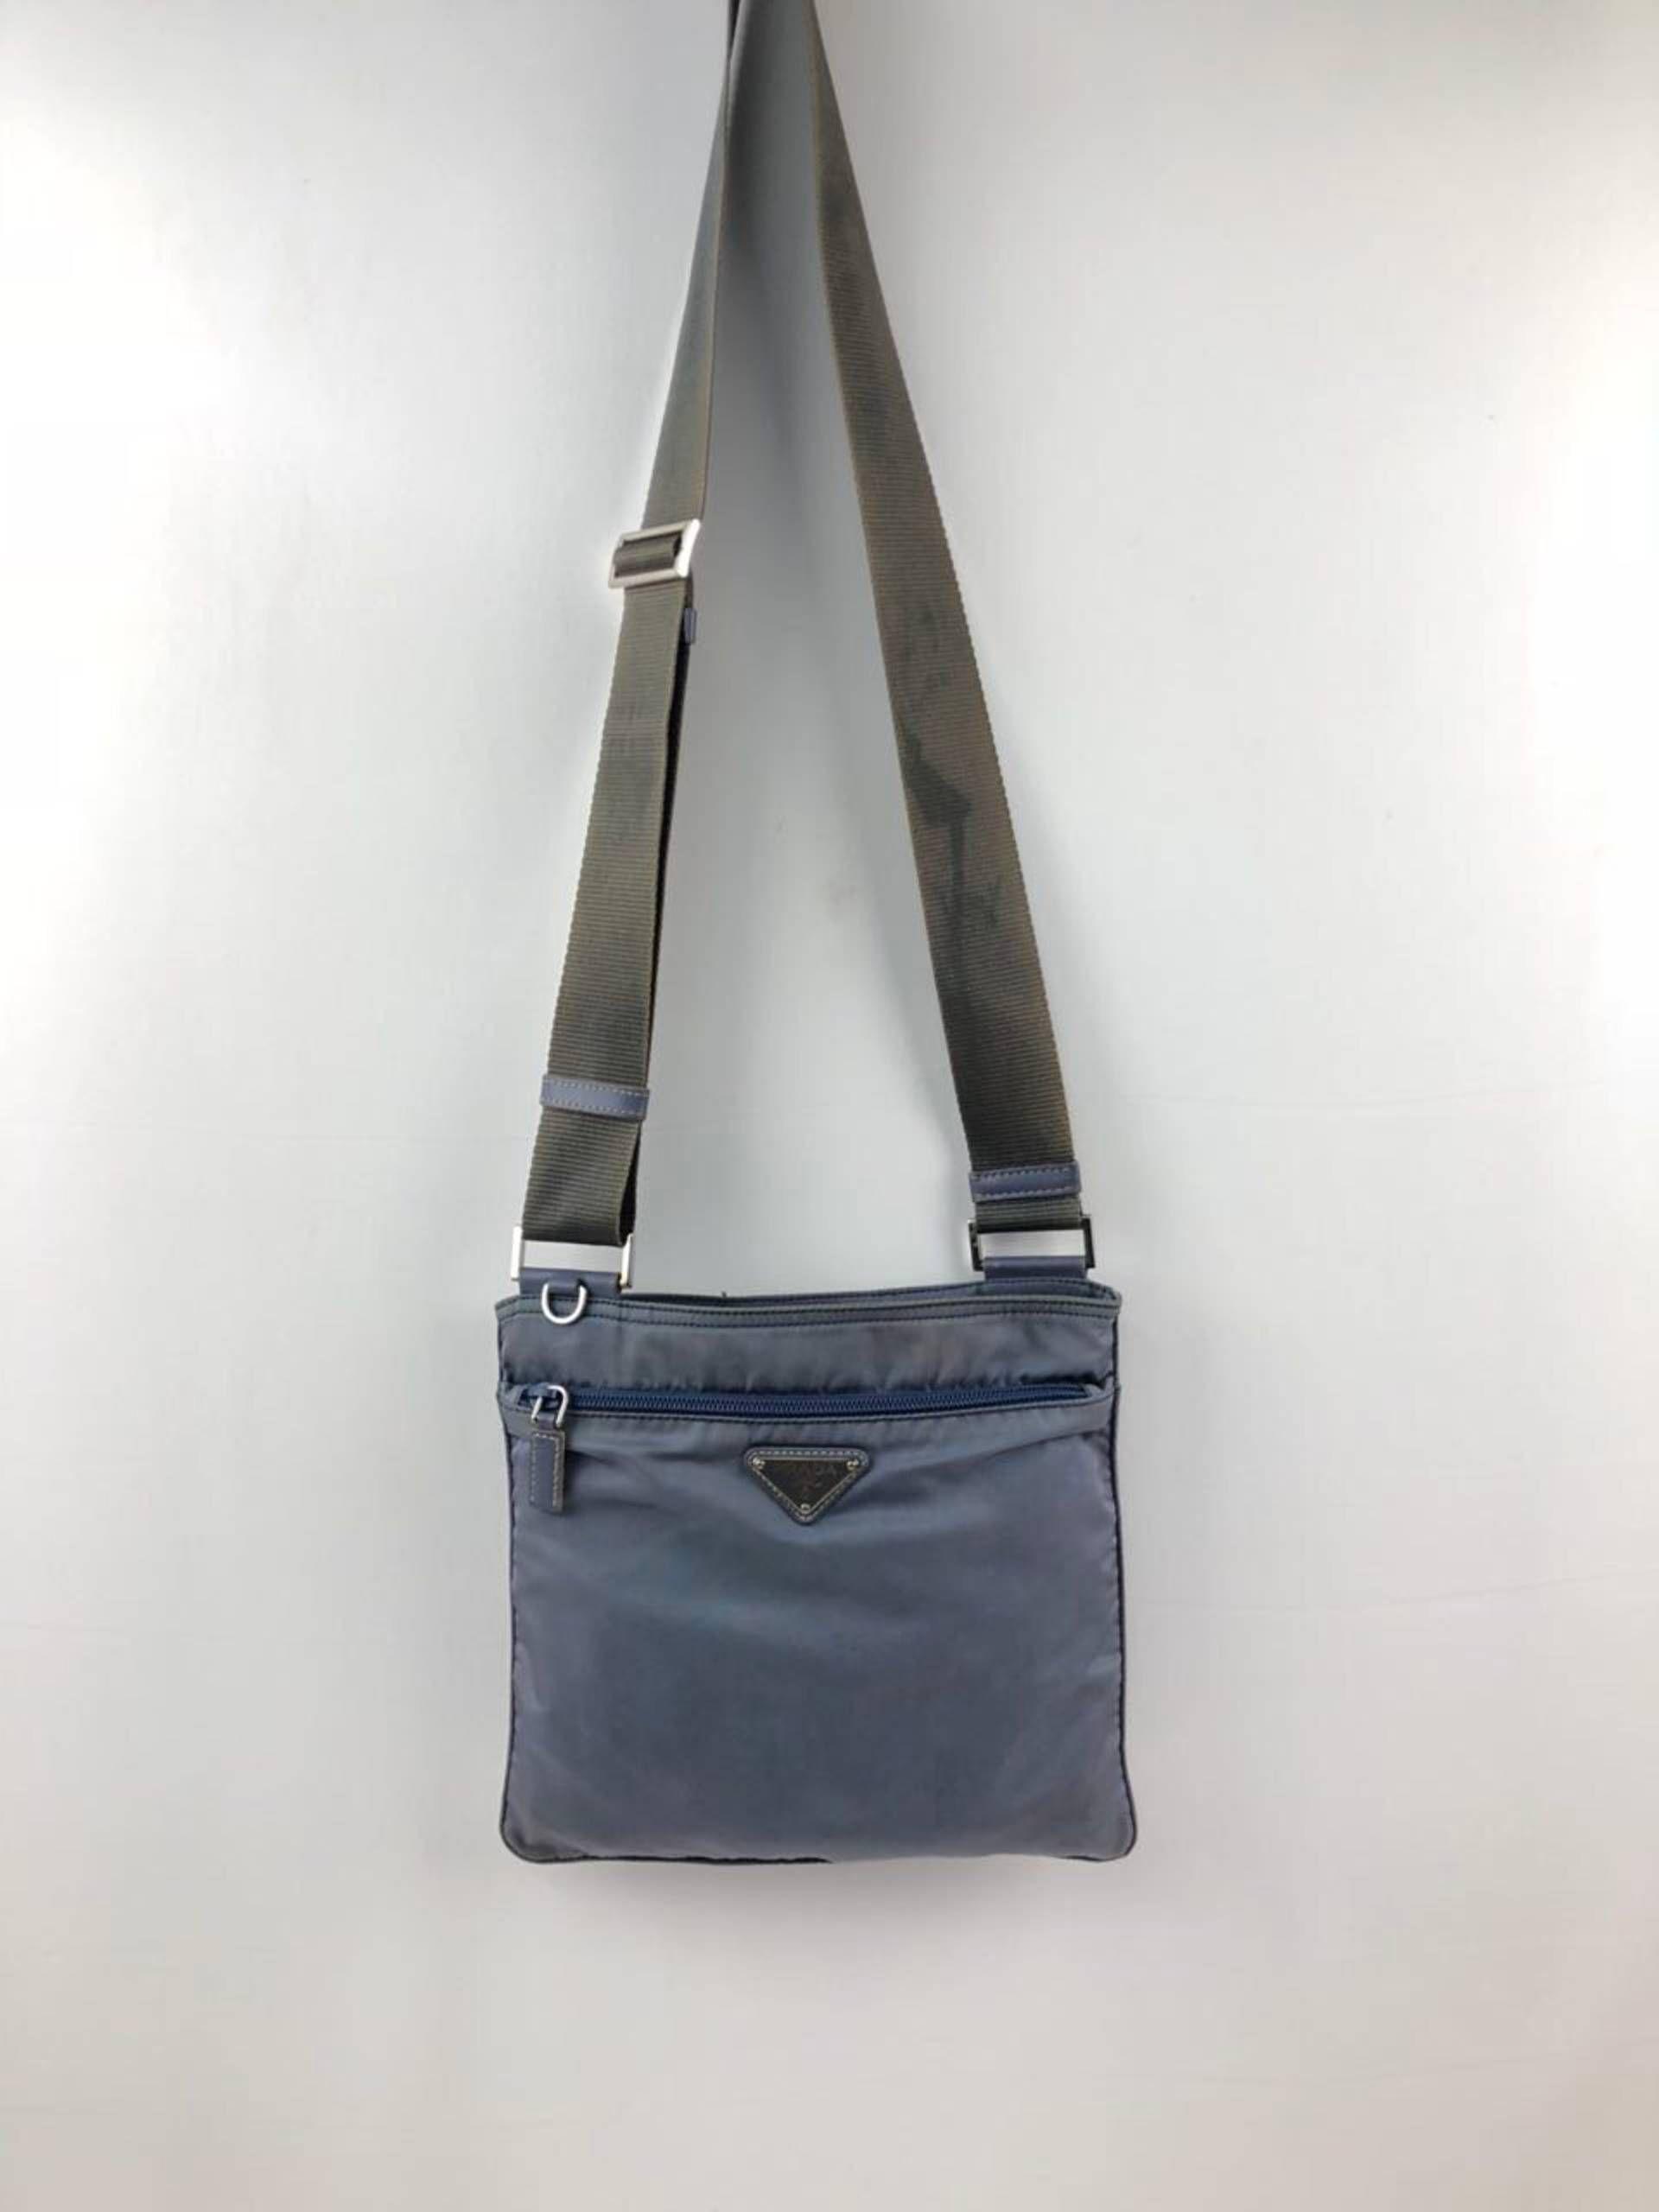 b7cde744388 Prada PRADA LIGHT BLUE NYLON CROSSBODY BAG Size ONE SIZE - 5 ...